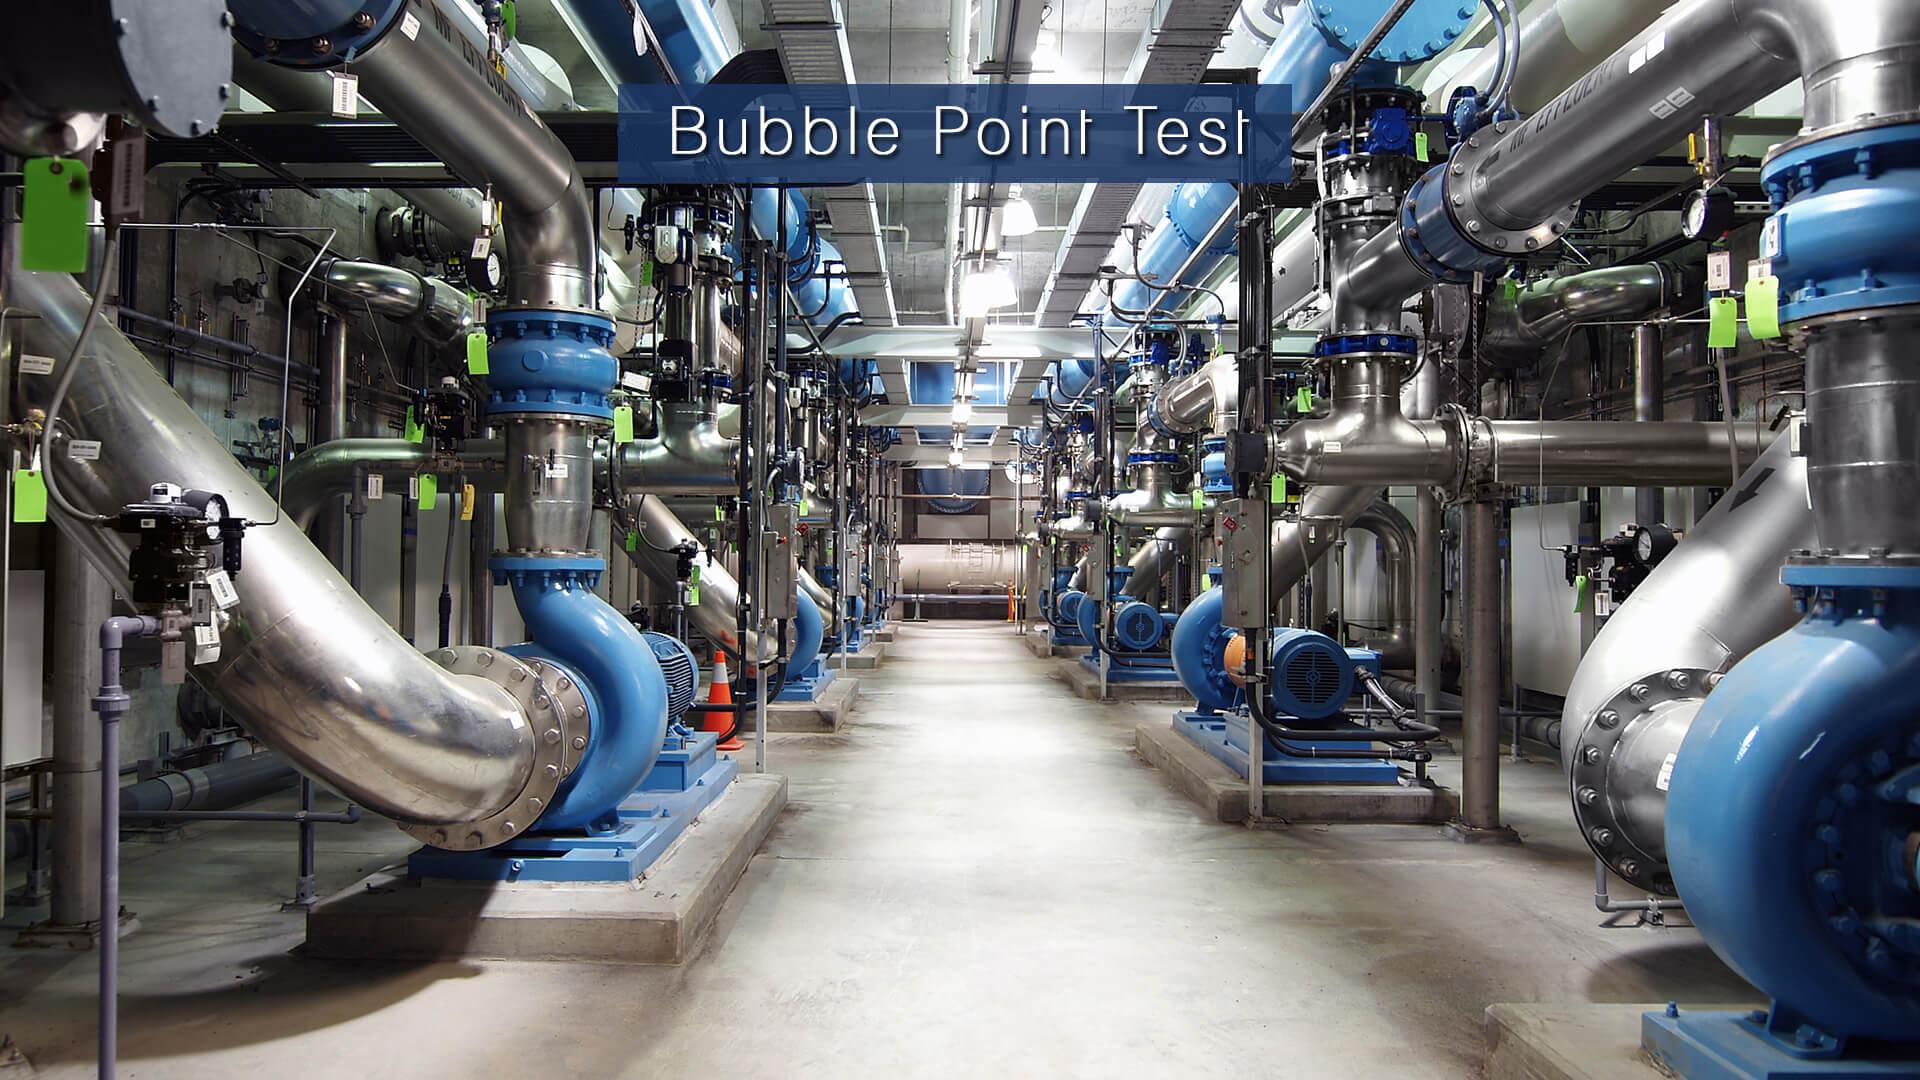 Bubble Point Test Filter Concept